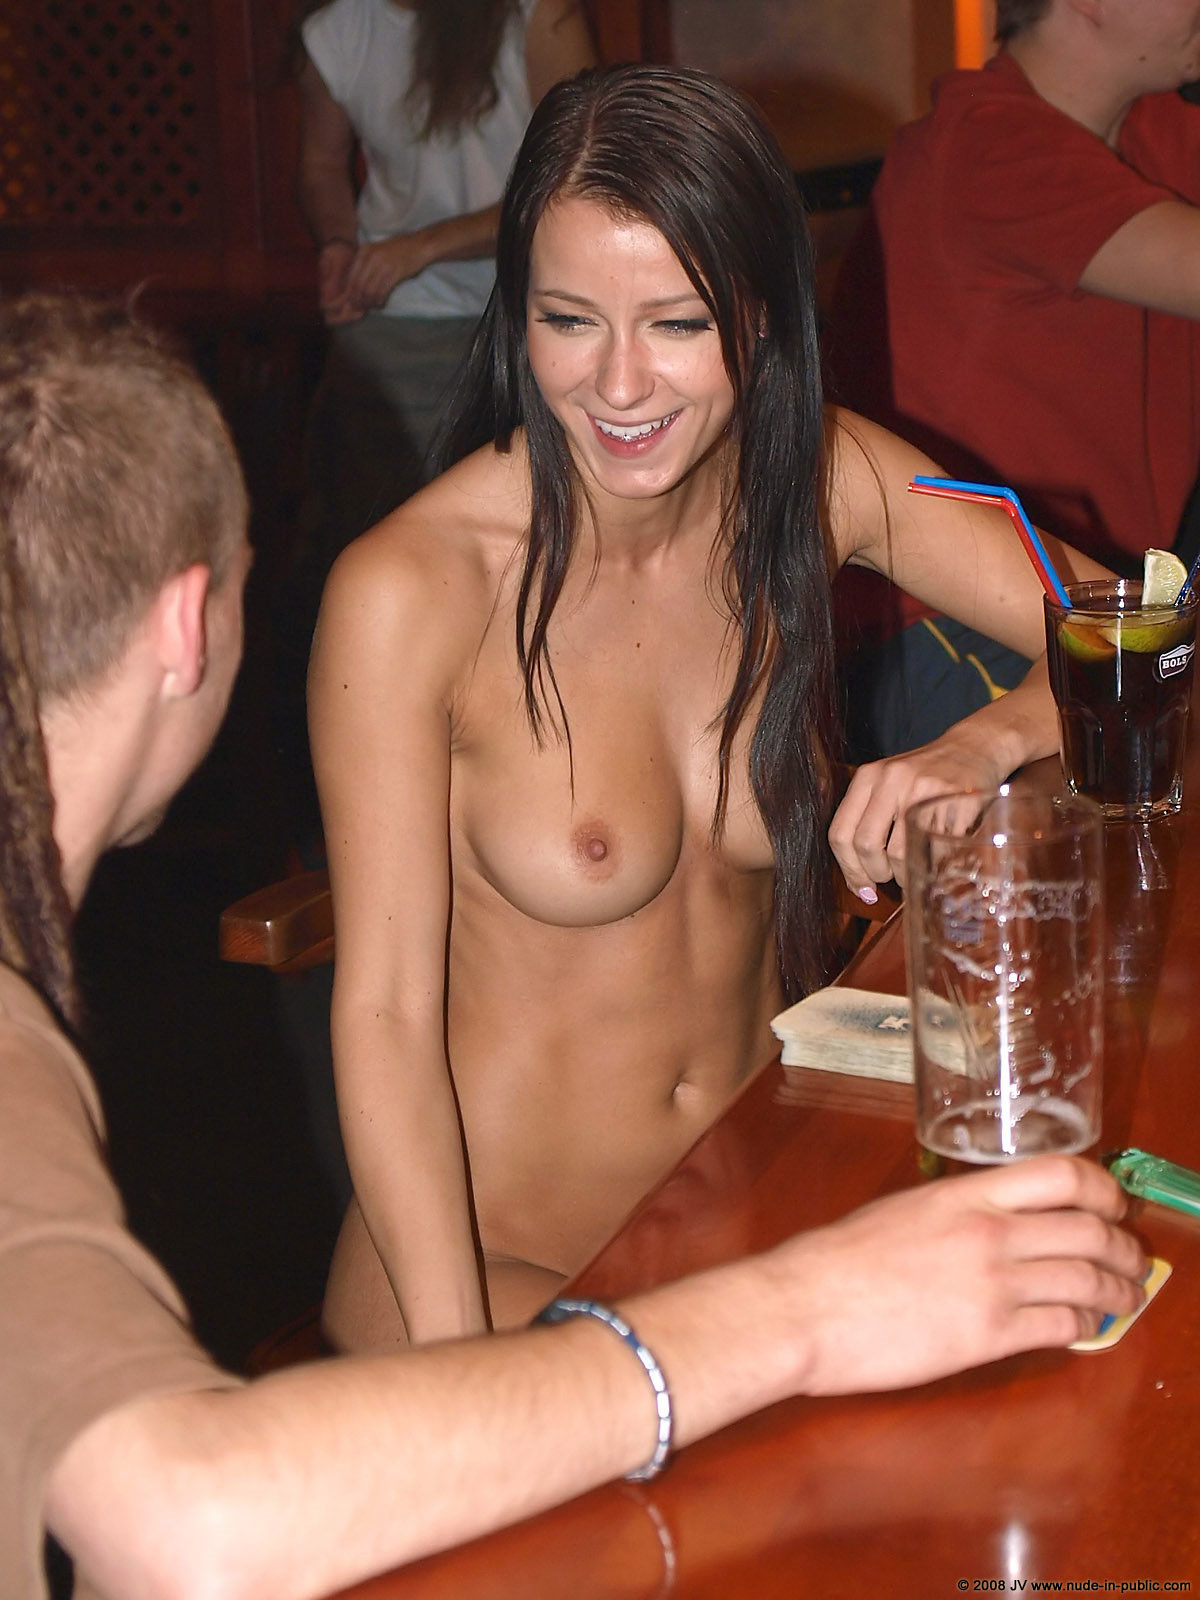 melisa-pub-beer-bar-girl-nude-in-public-50